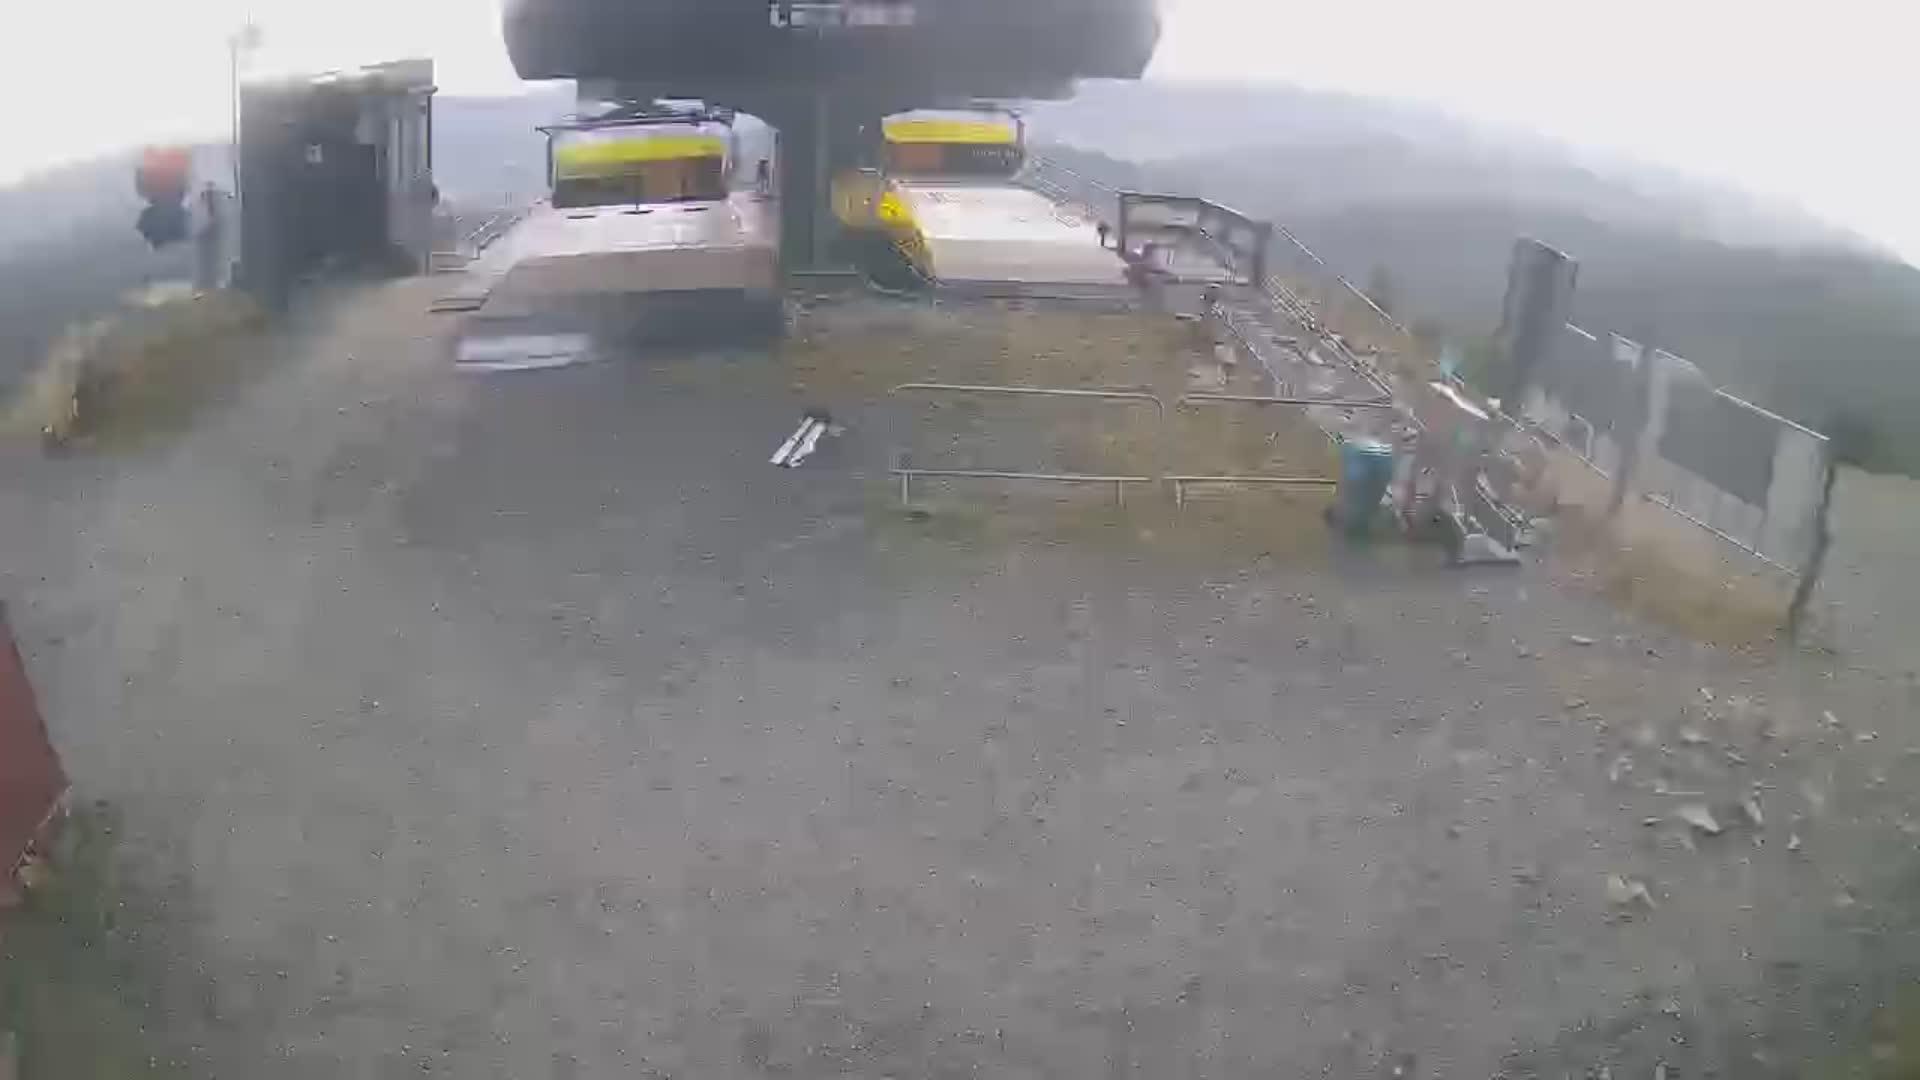 Webcam Skigebiet Czarna Gora cam 8 - Glatzer Schneegebirge